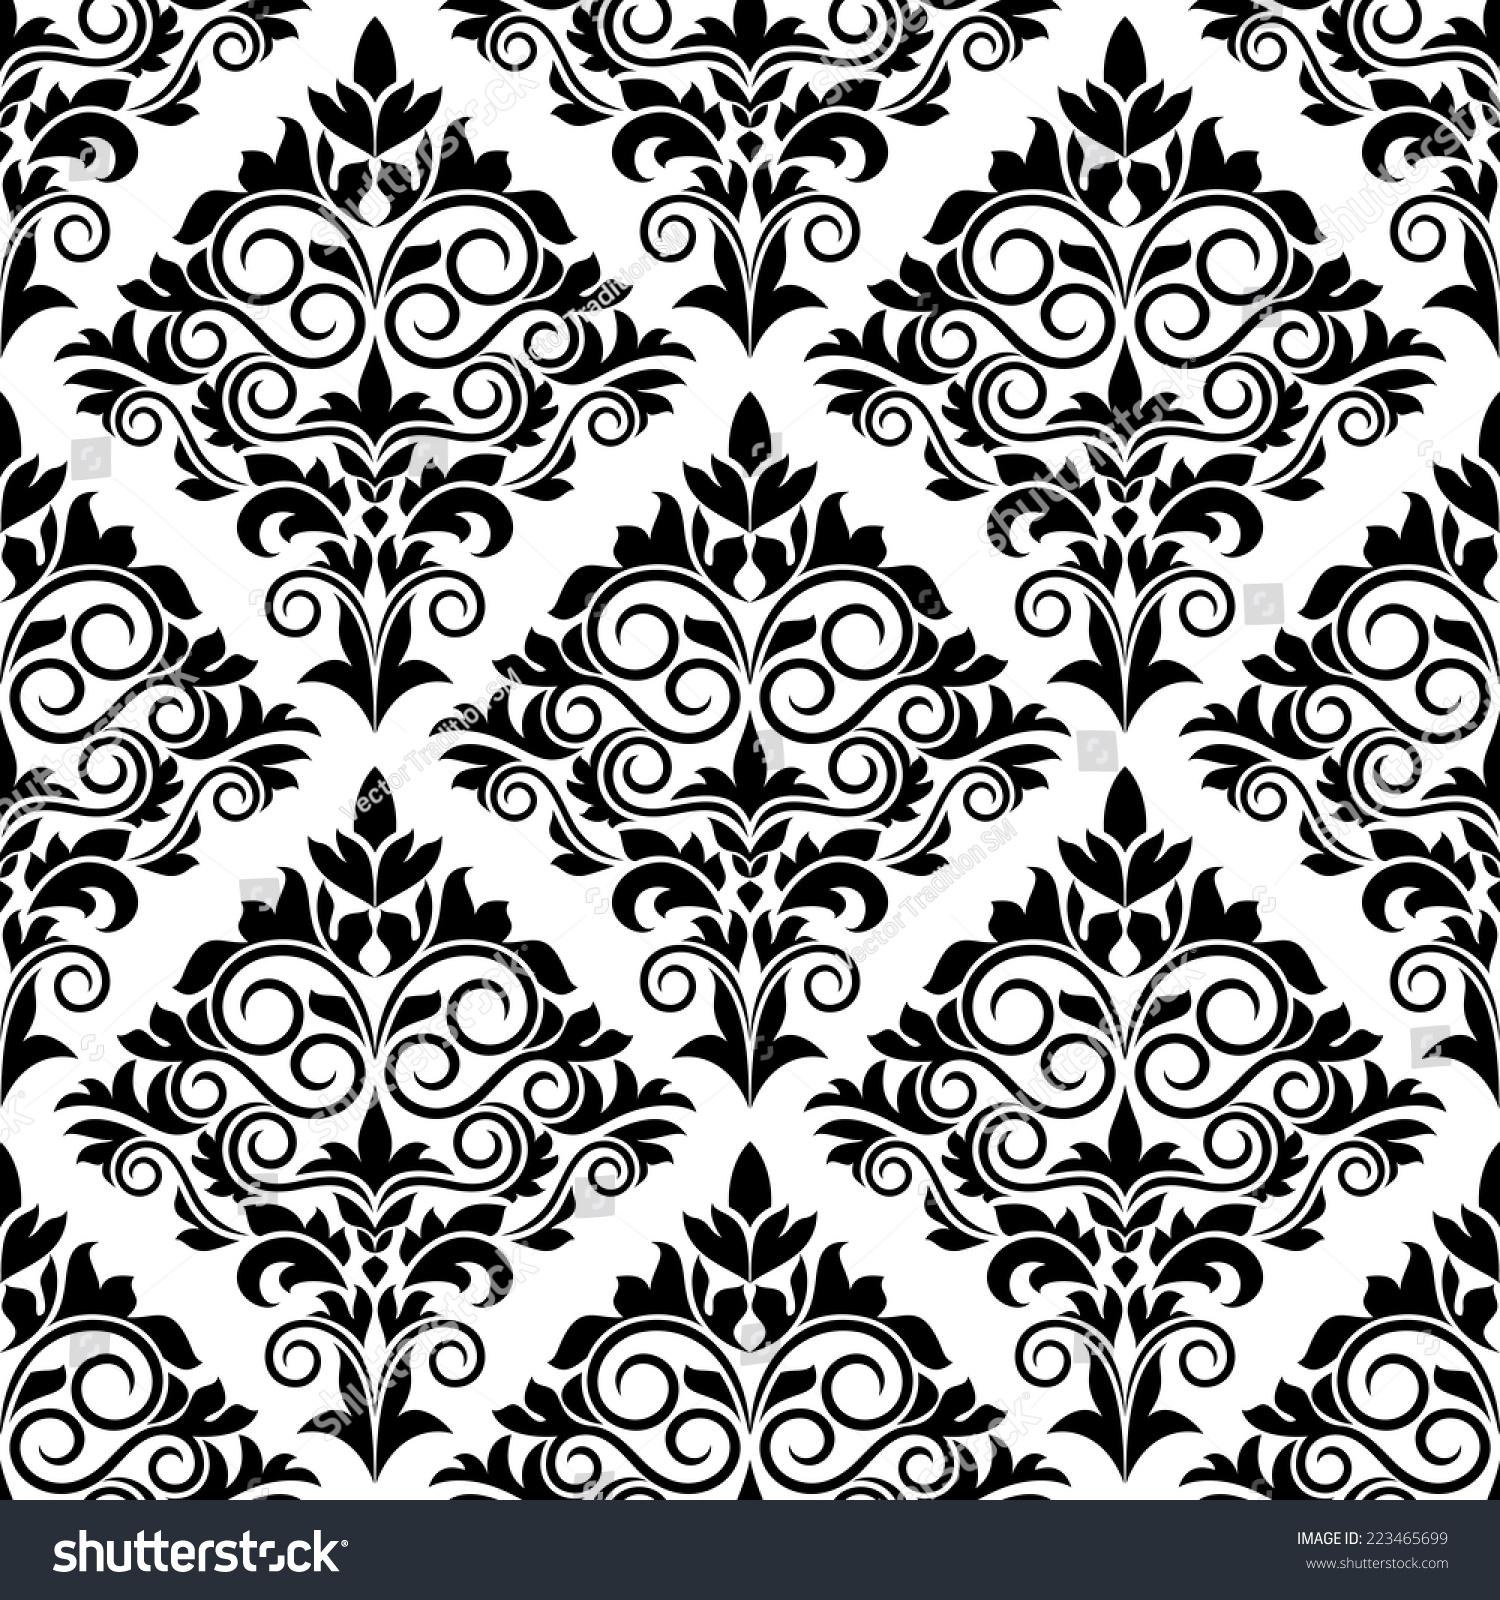 black white arabesque design scrolls leaves stock vector. Black Bedroom Furniture Sets. Home Design Ideas